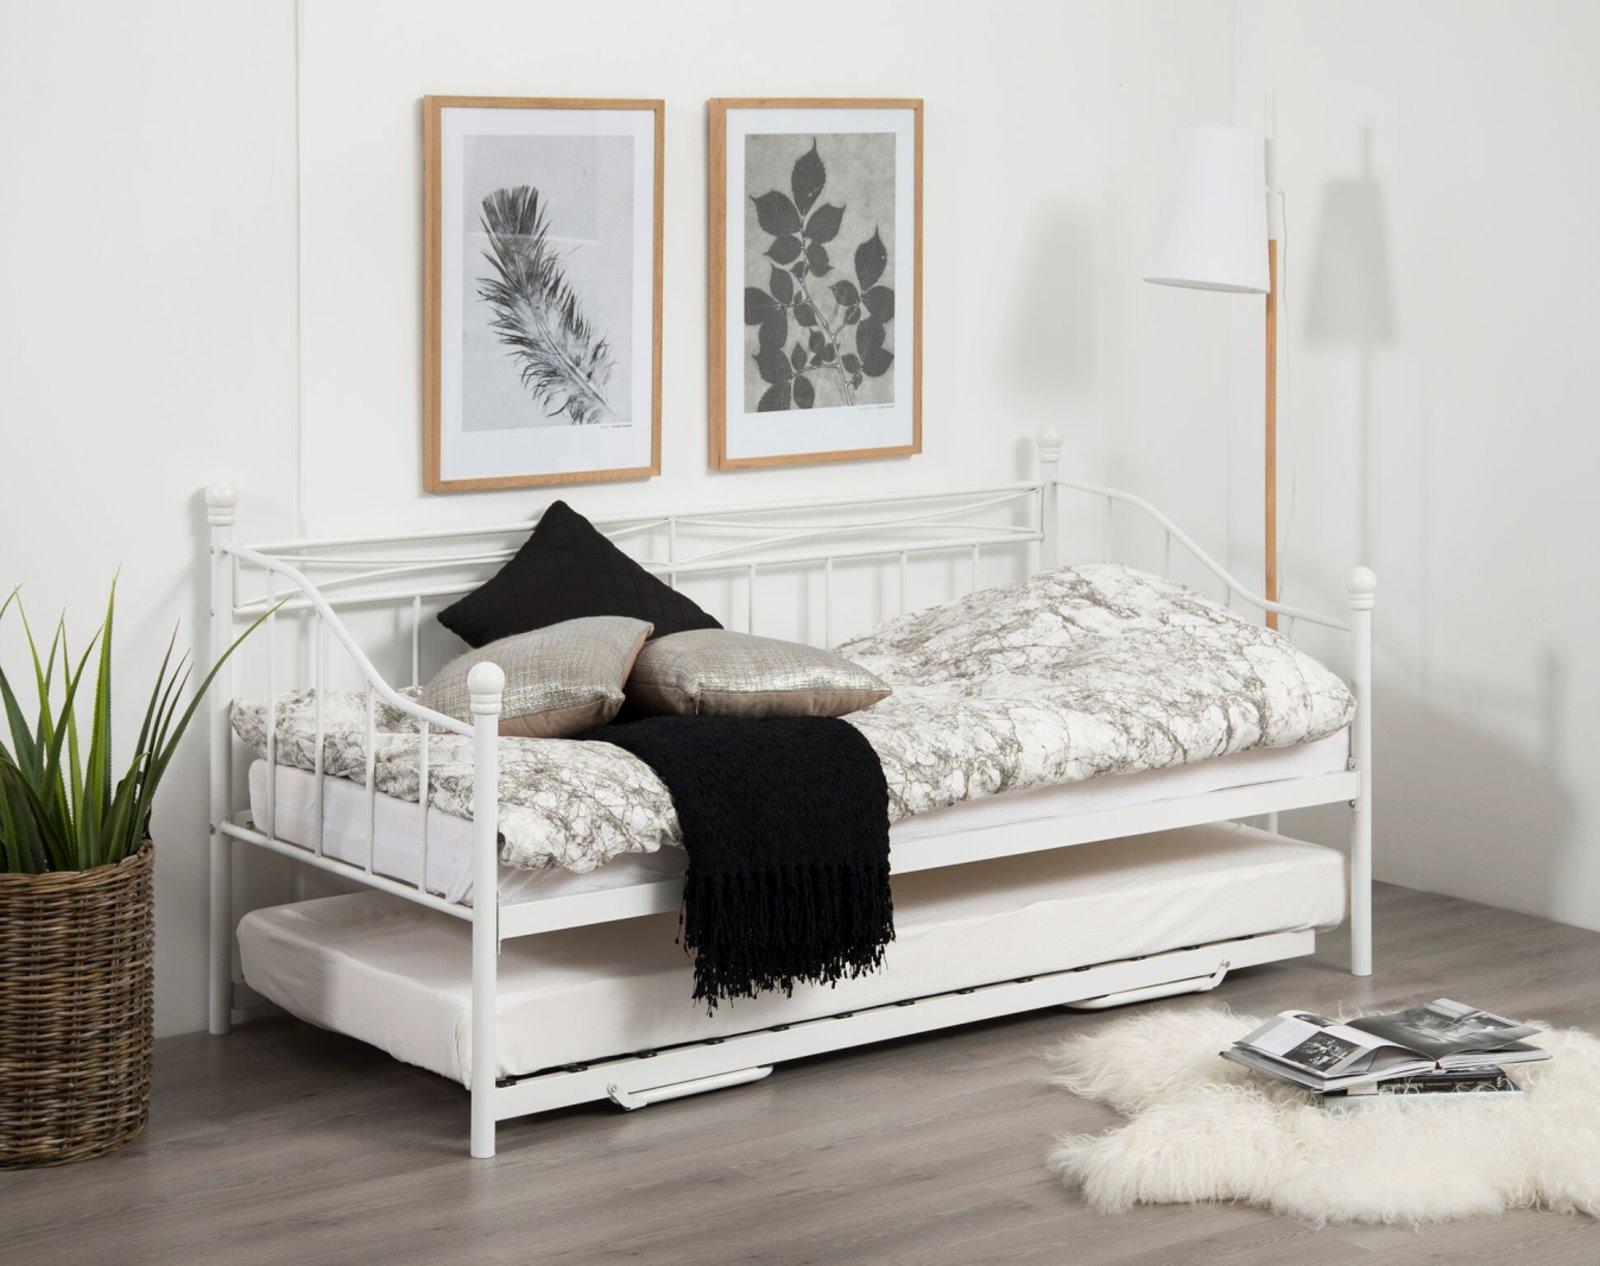 pkline metallbett oline in wei mit auszug 90x190 bett jugendbett tagesbett ebay. Black Bedroom Furniture Sets. Home Design Ideas